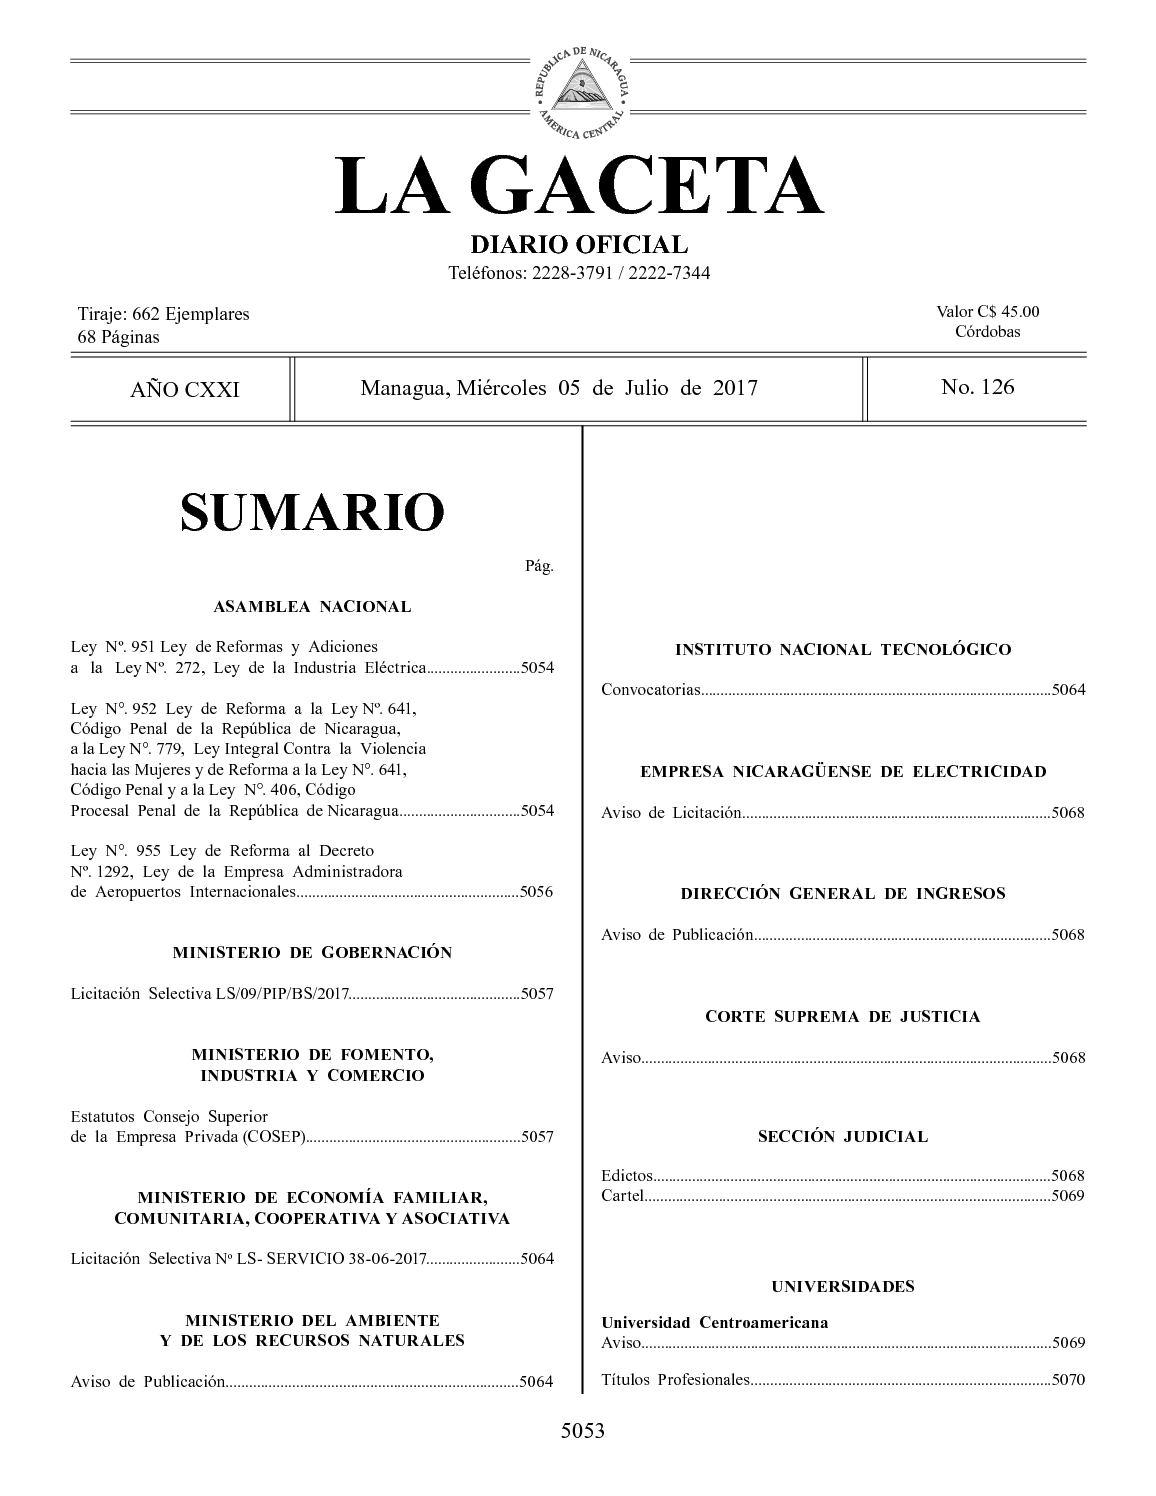 Gaceta No 126 Miércoles 05 De Julio De 2017